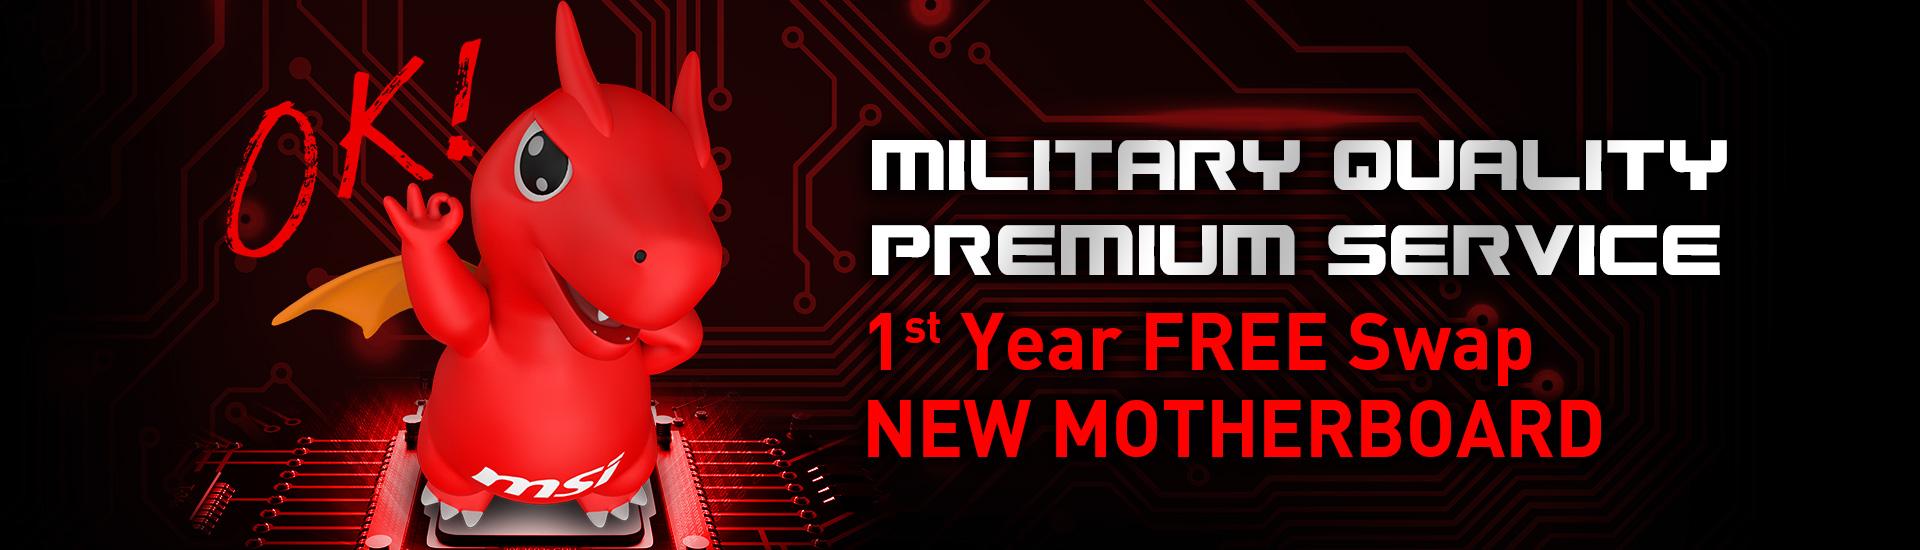 Military Quality Premium Service